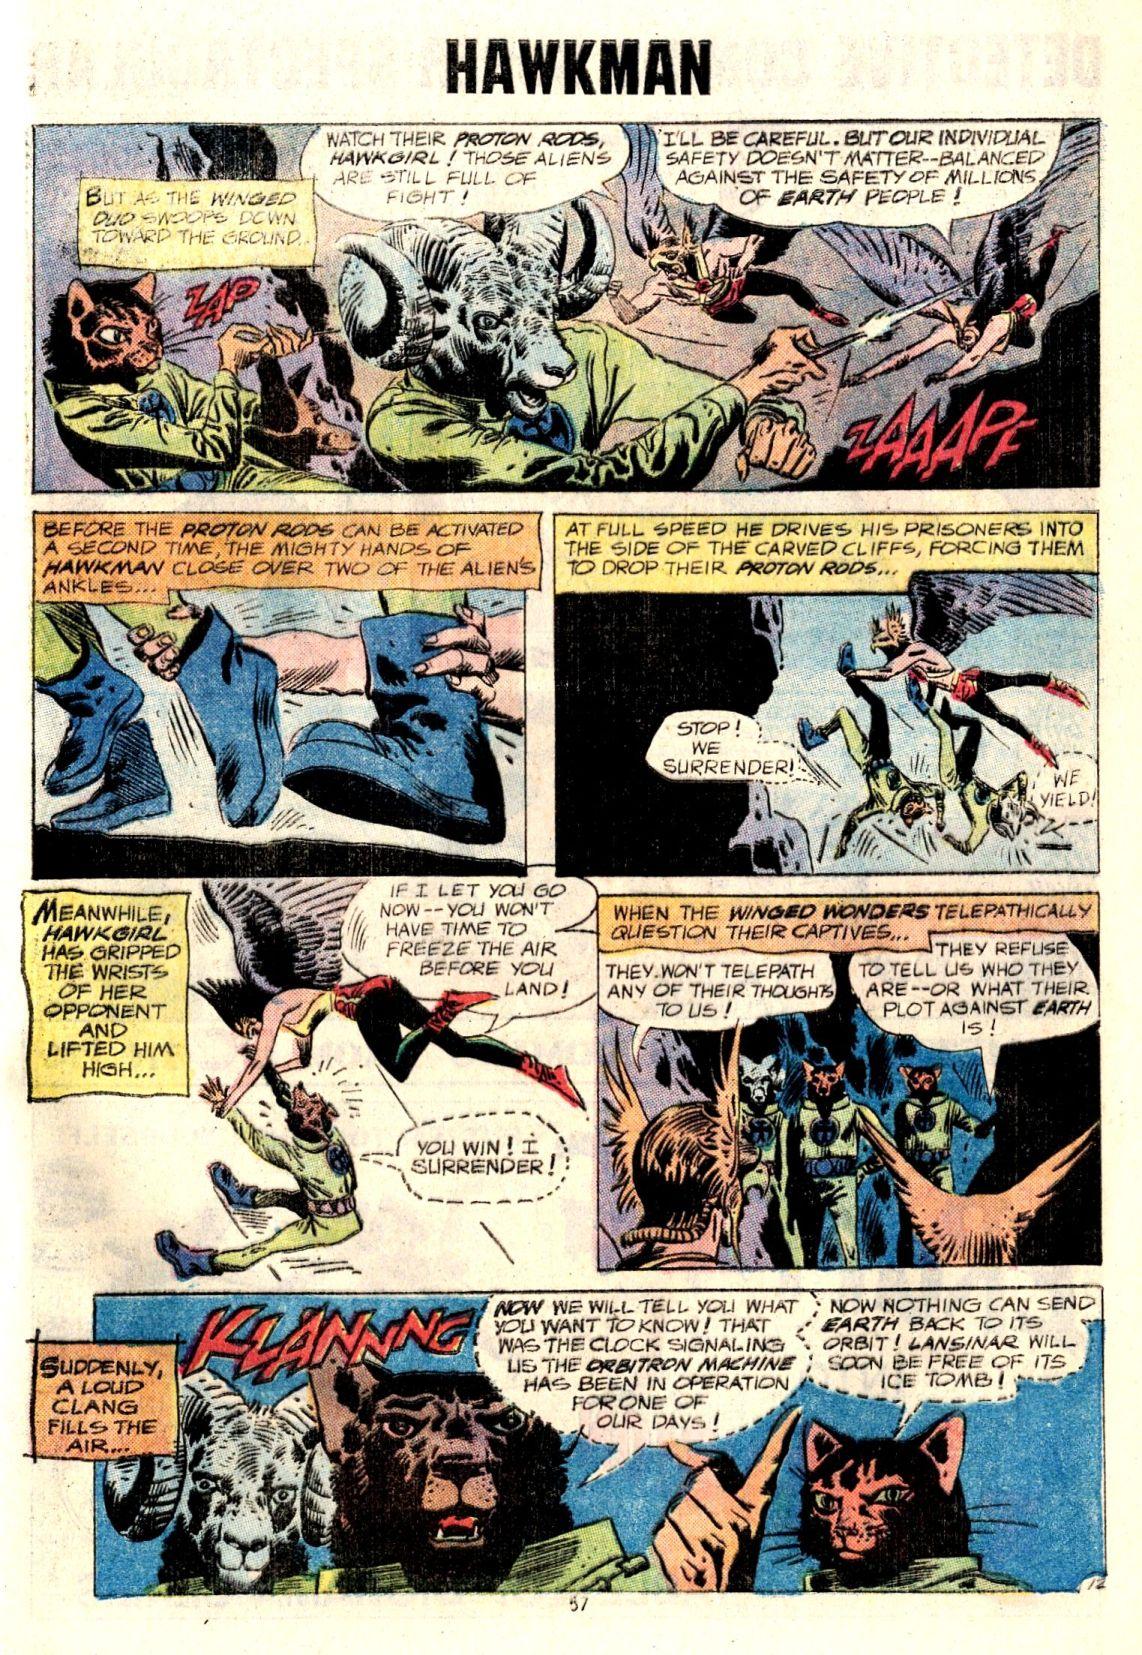 Detective Comics (1937) 438 Page 57